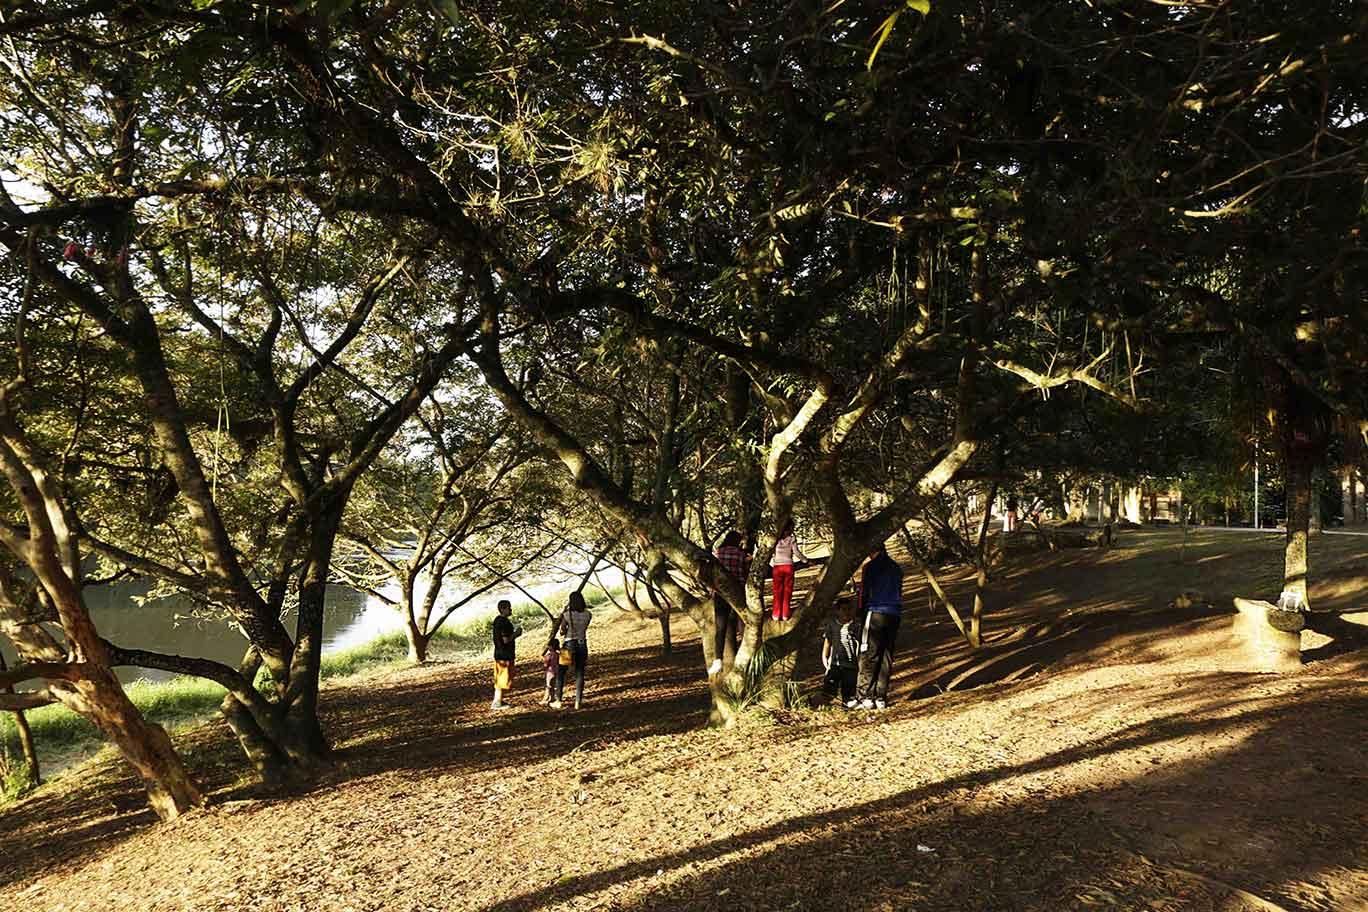 Bosque da Princesaem Pindamonhangaba -_MG_6929-bx